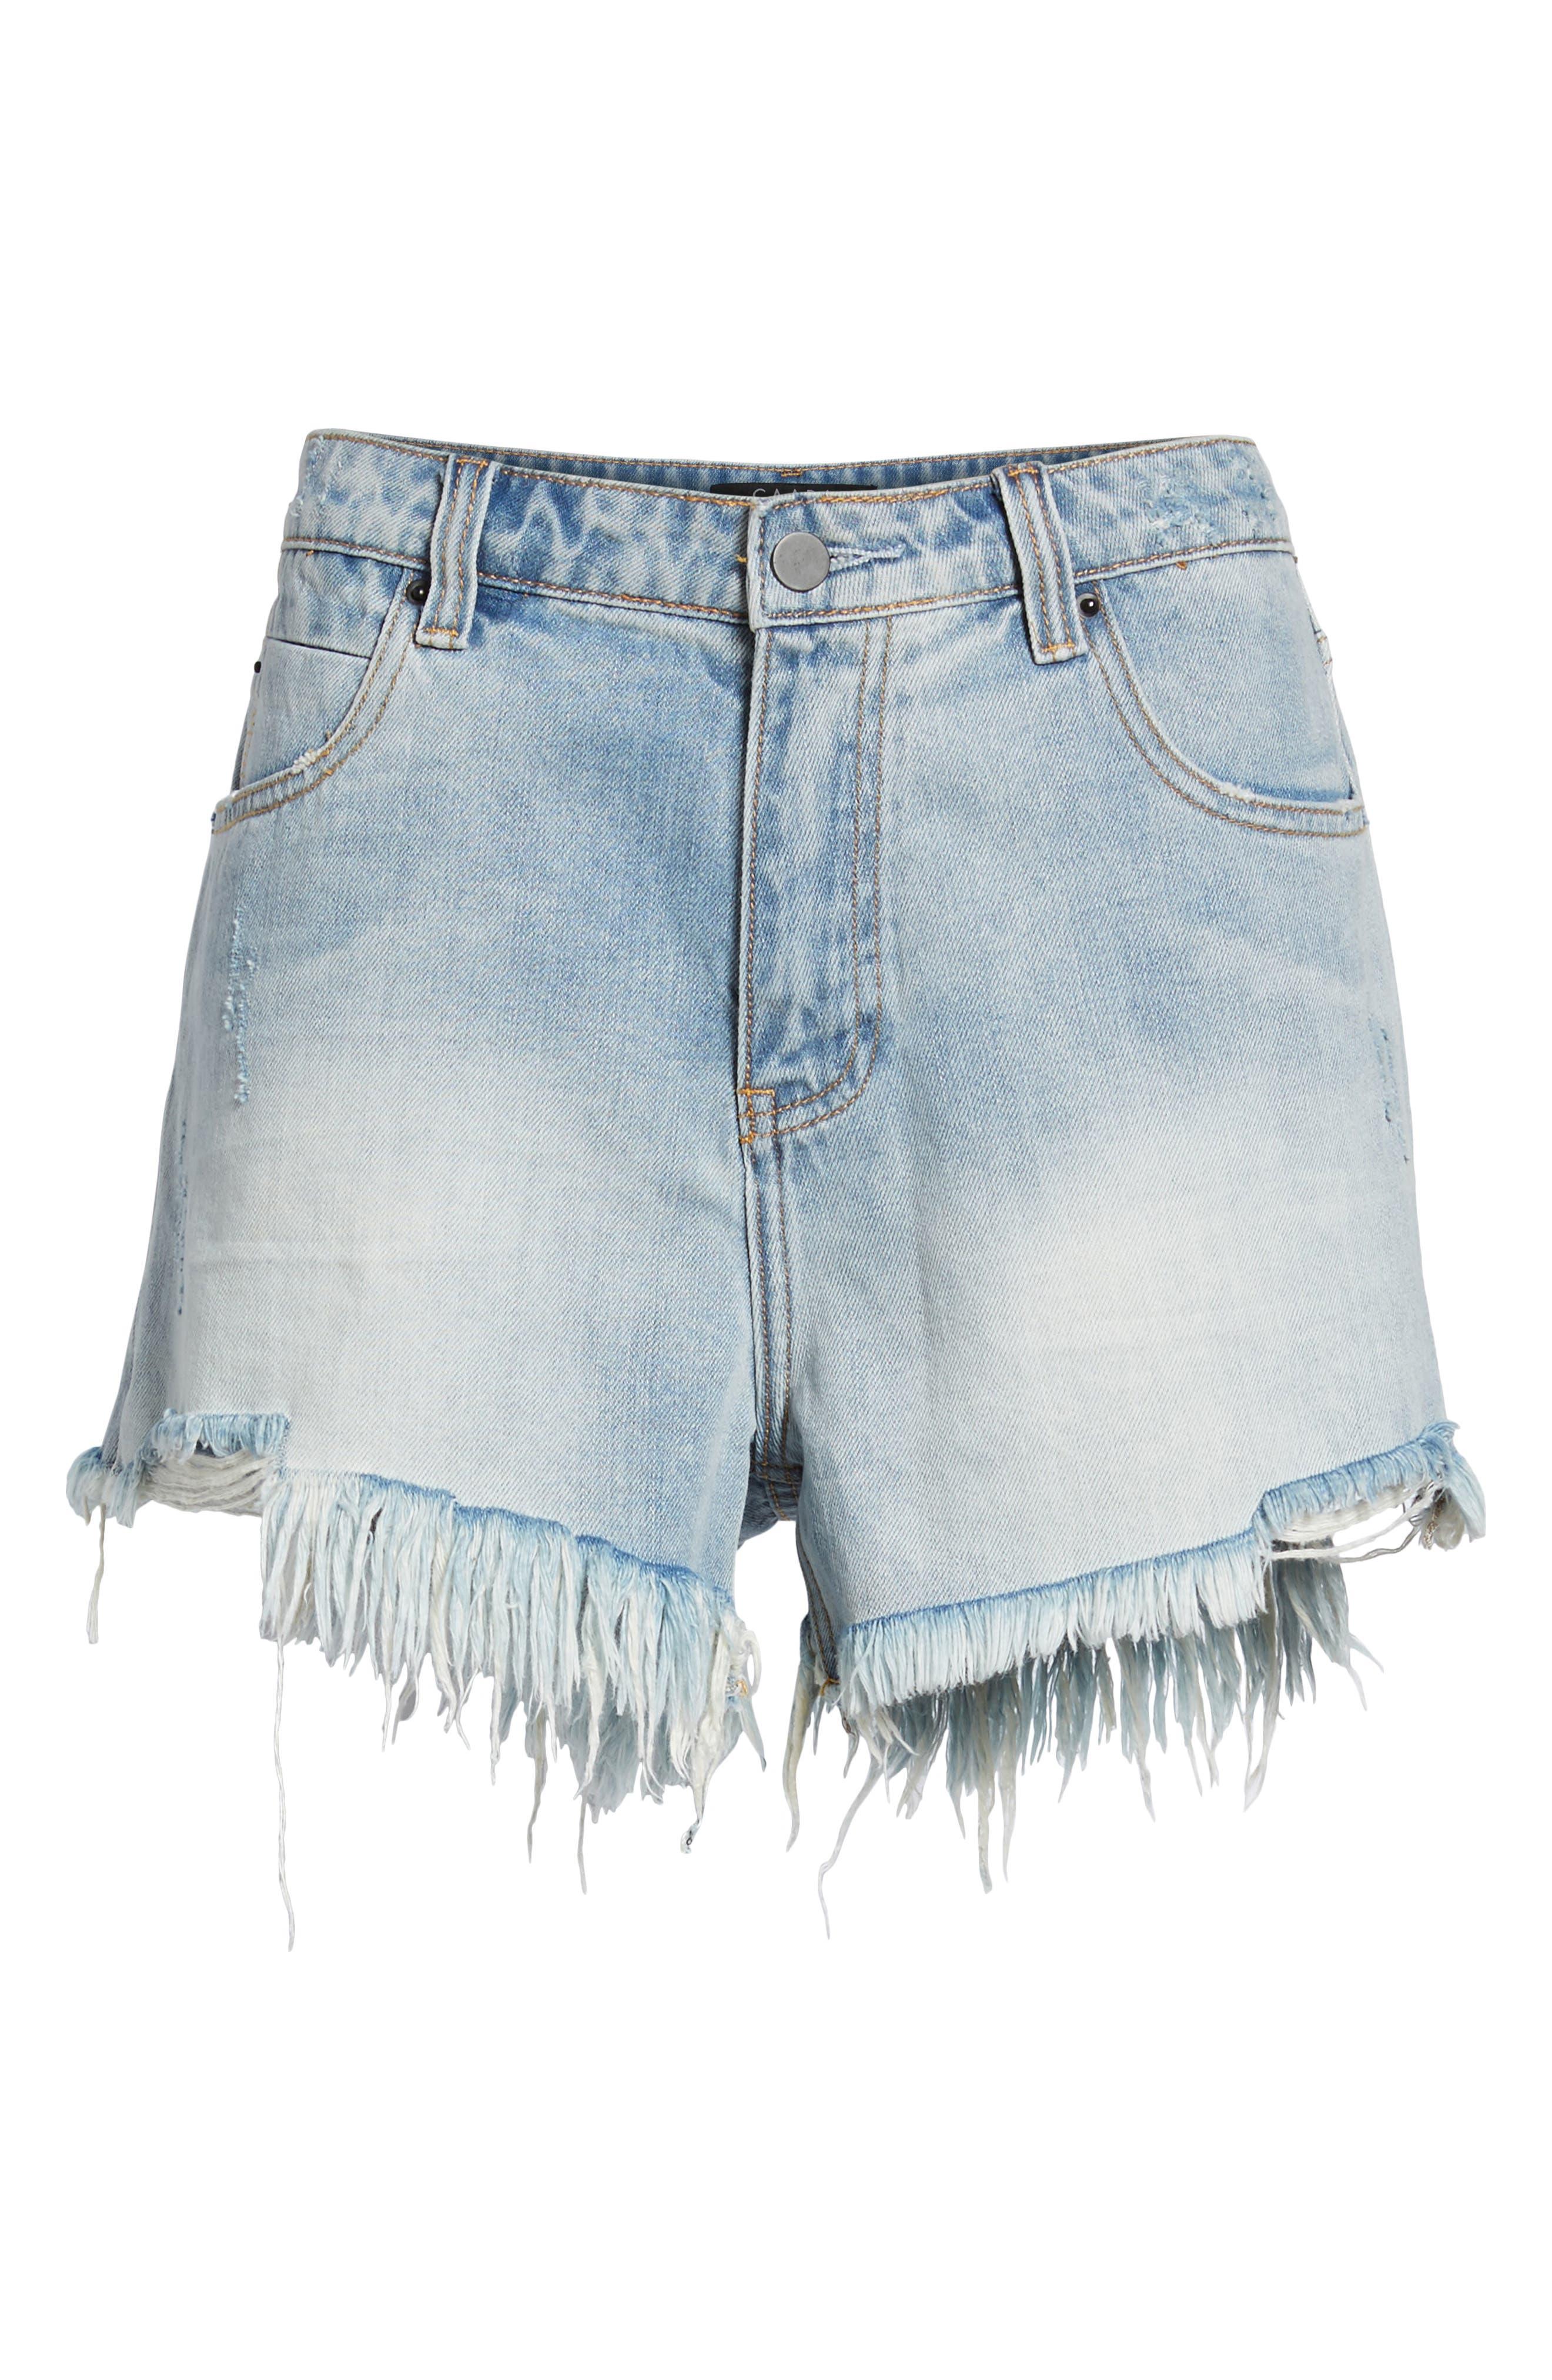 Arien High Waist Cutoff Denim Shorts,                             Alternate thumbnail 6, color,                             Washed Blue